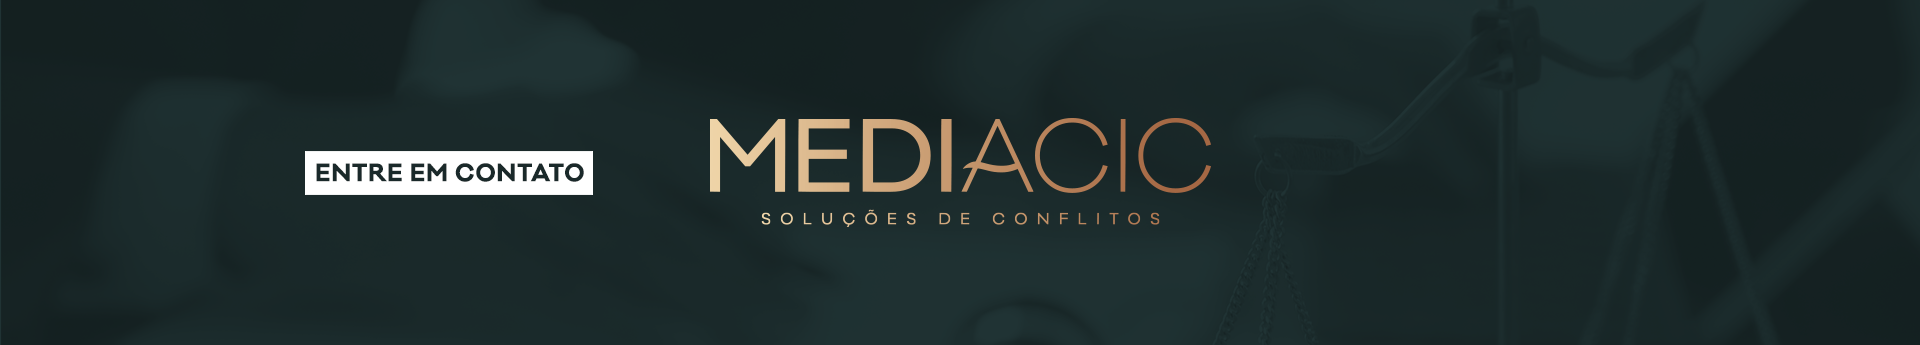 Mediacic